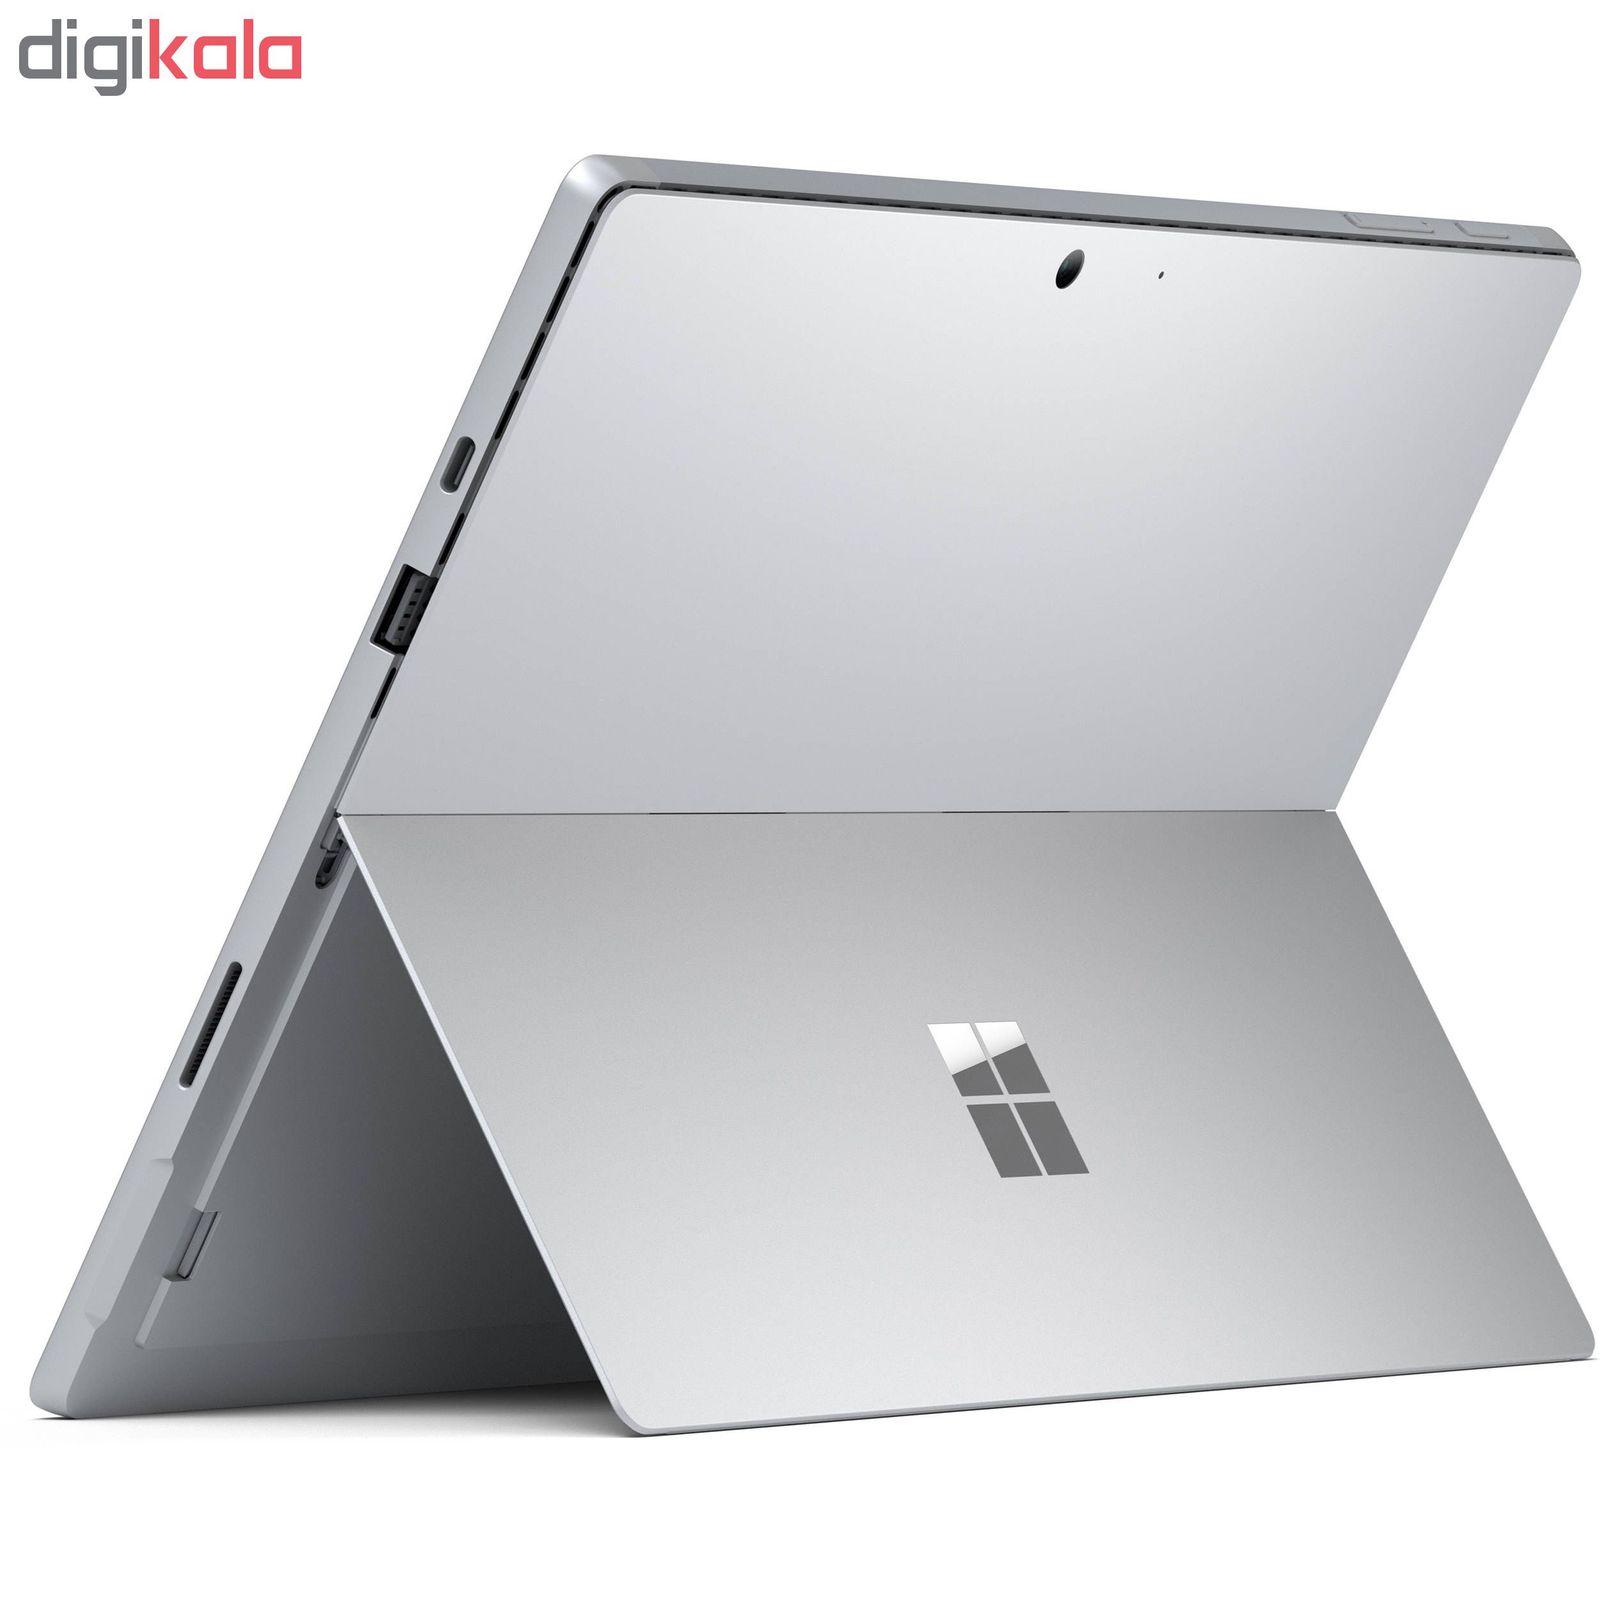 تبلت مایکروسافت مدل Surface Pro 7 - C به همراه کیبورد Black Type Cover main 1 6